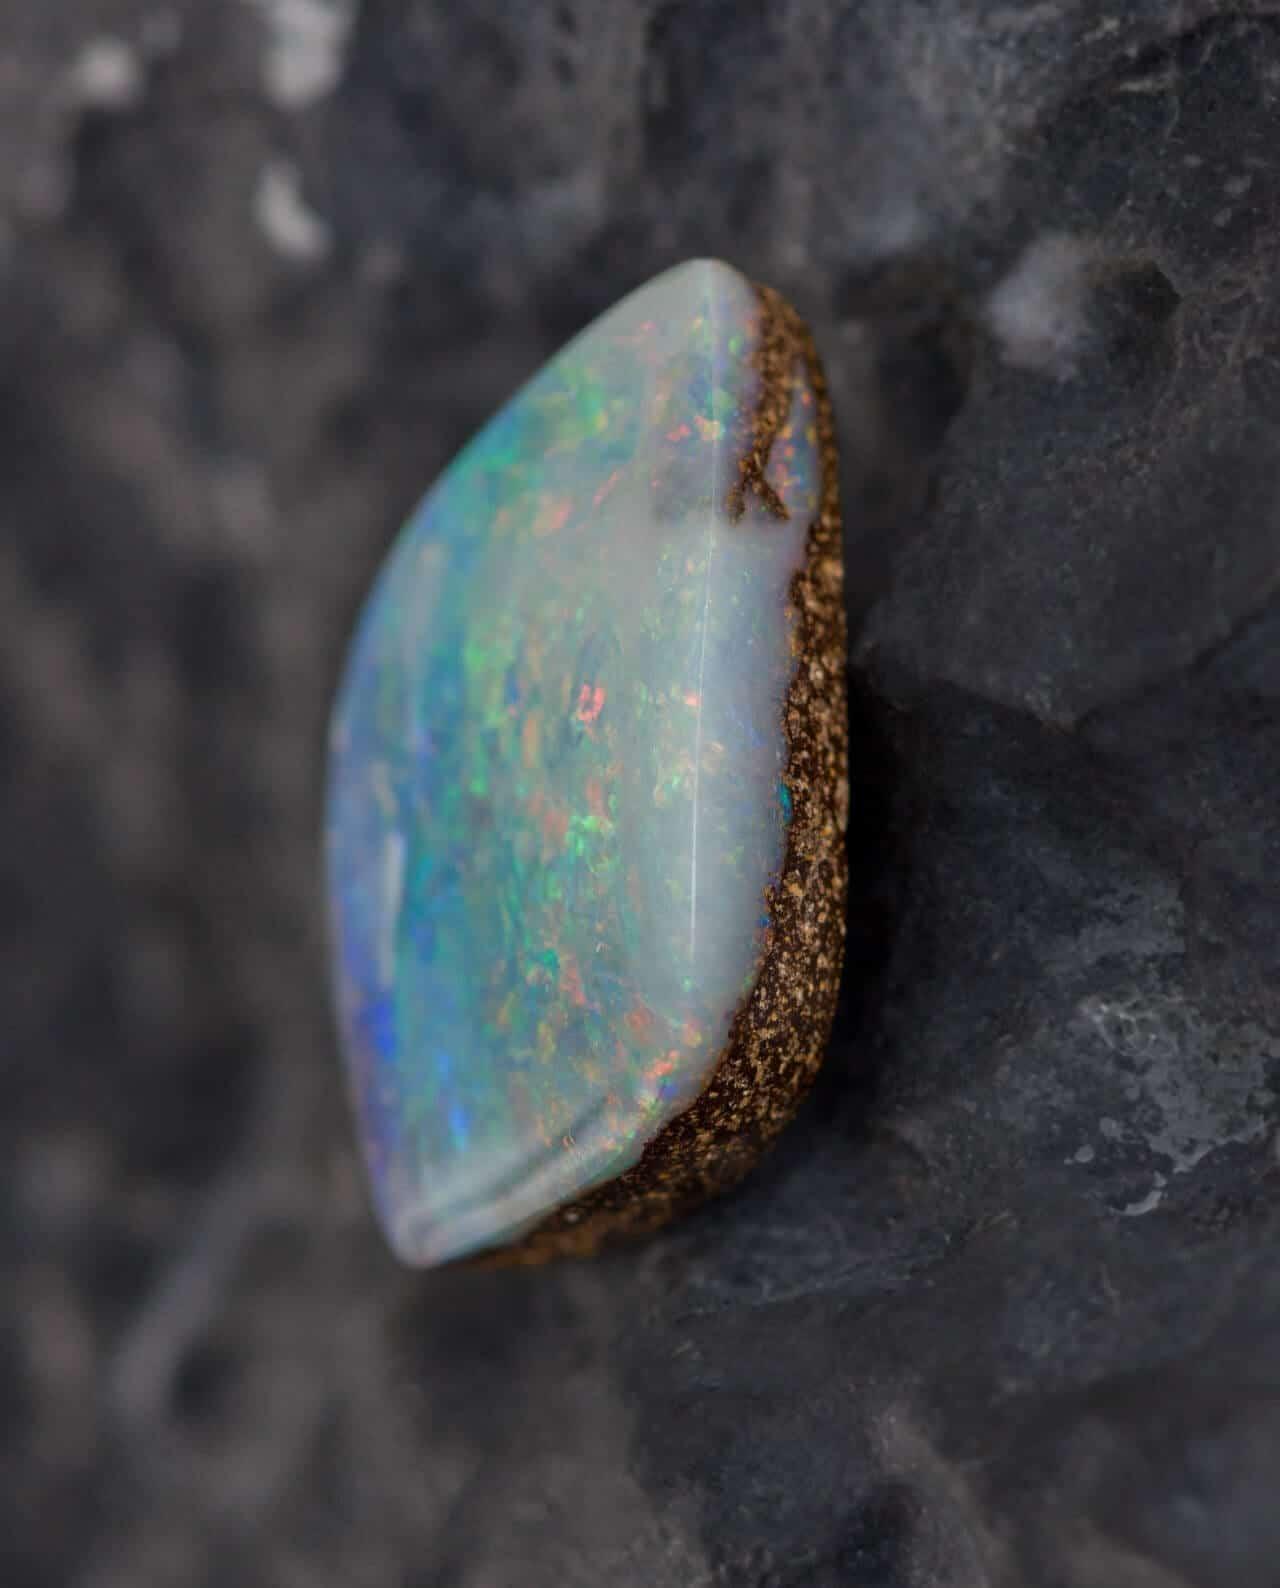 CONLIGHT Seltener Premium Boulder-Opal aus Queensland